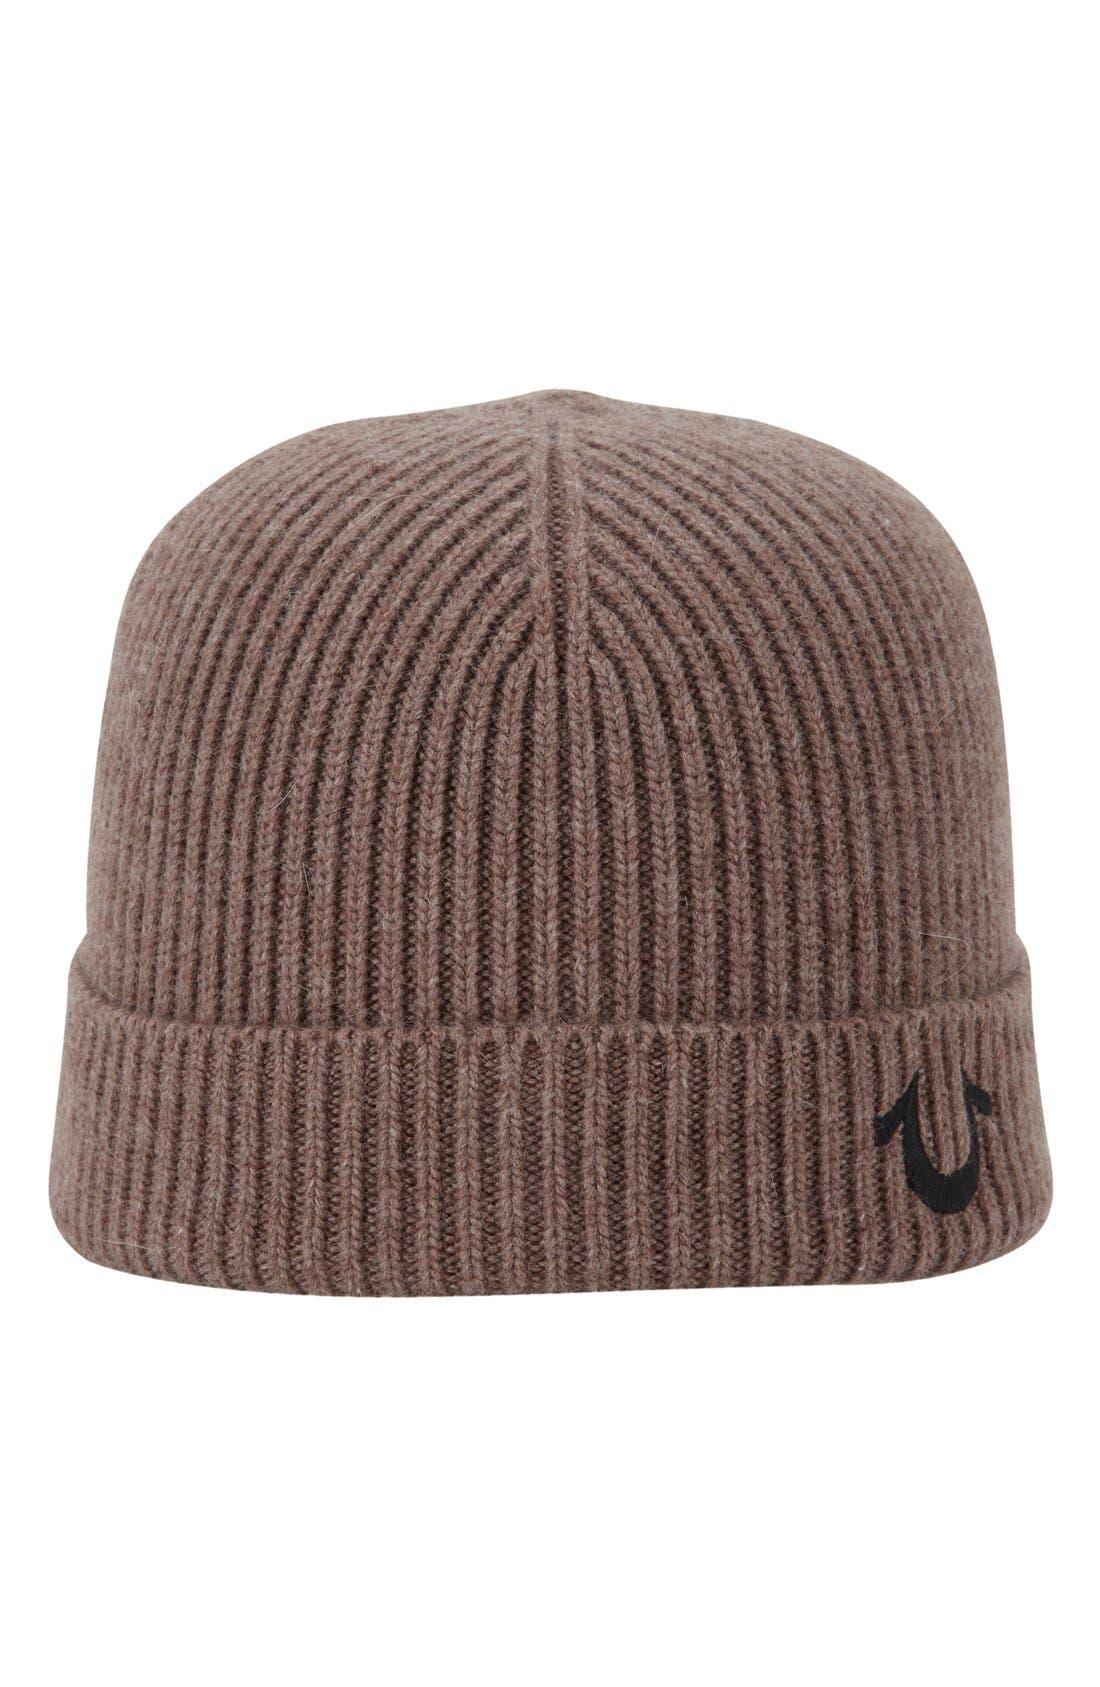 True Religion Brand Jeans Rib Knit Cap